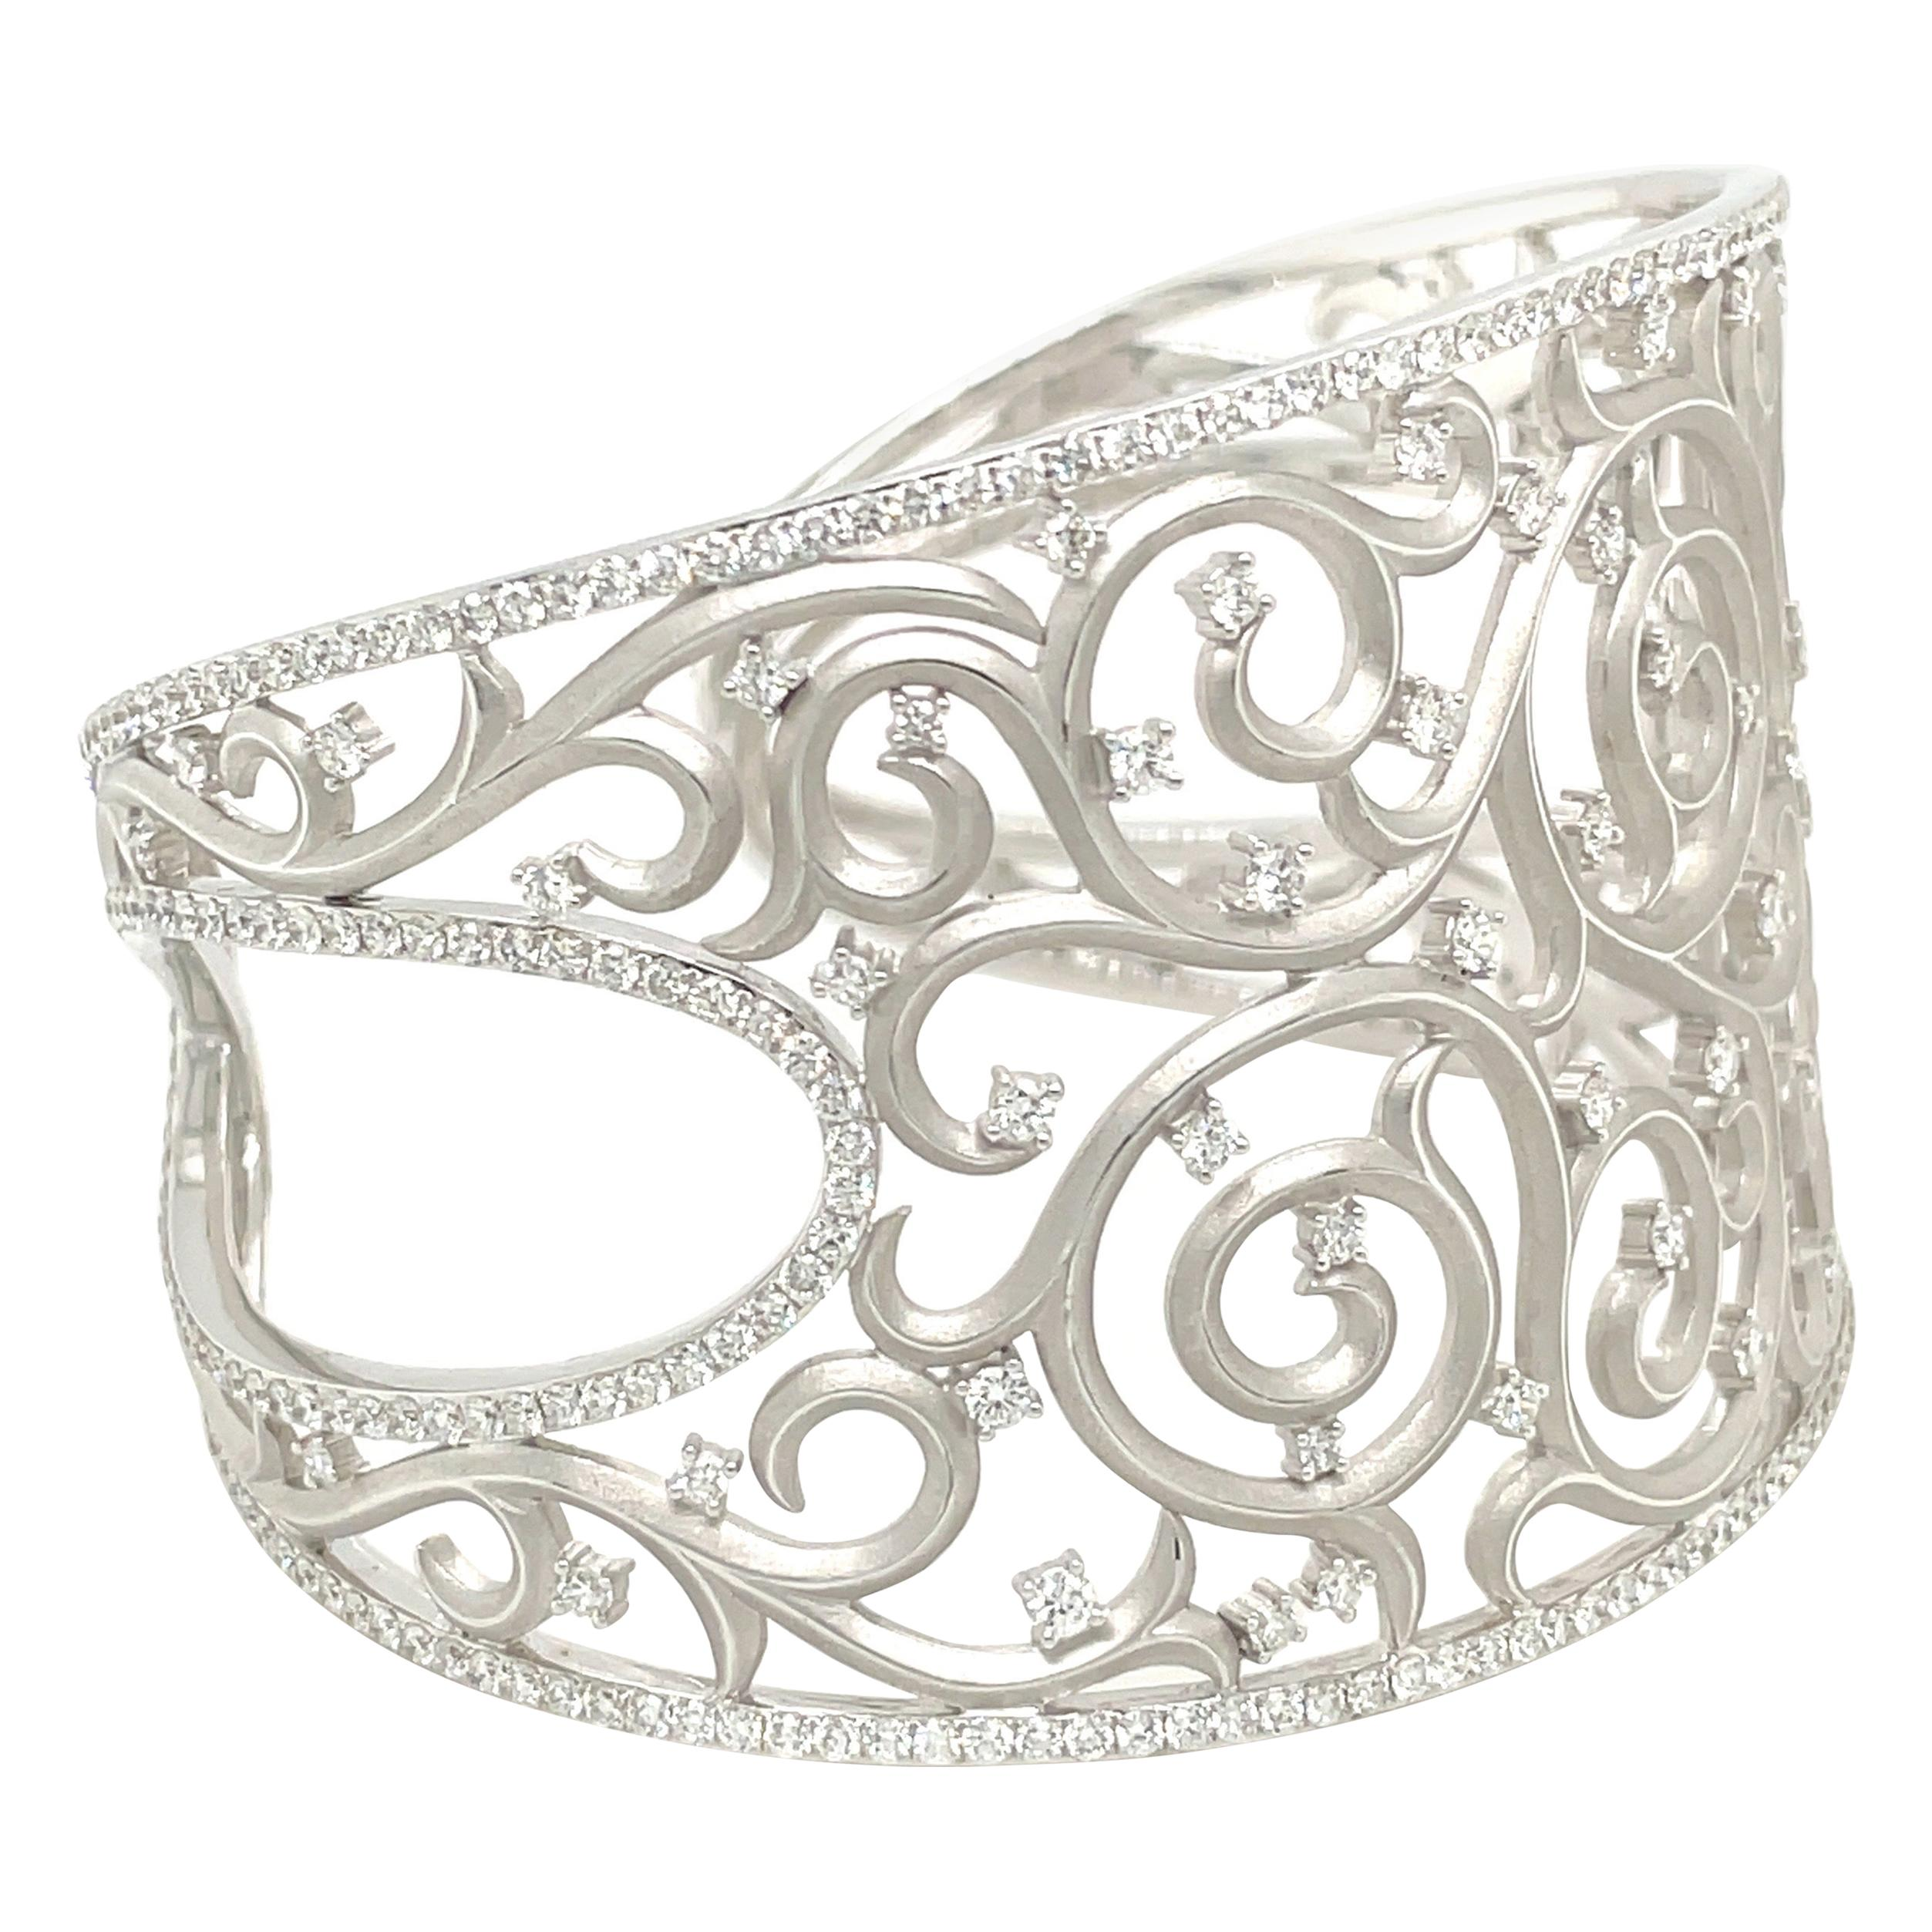 Cellini 18kt White Gold and Diamond 4.90Ct. Lace Cuff Bracelet